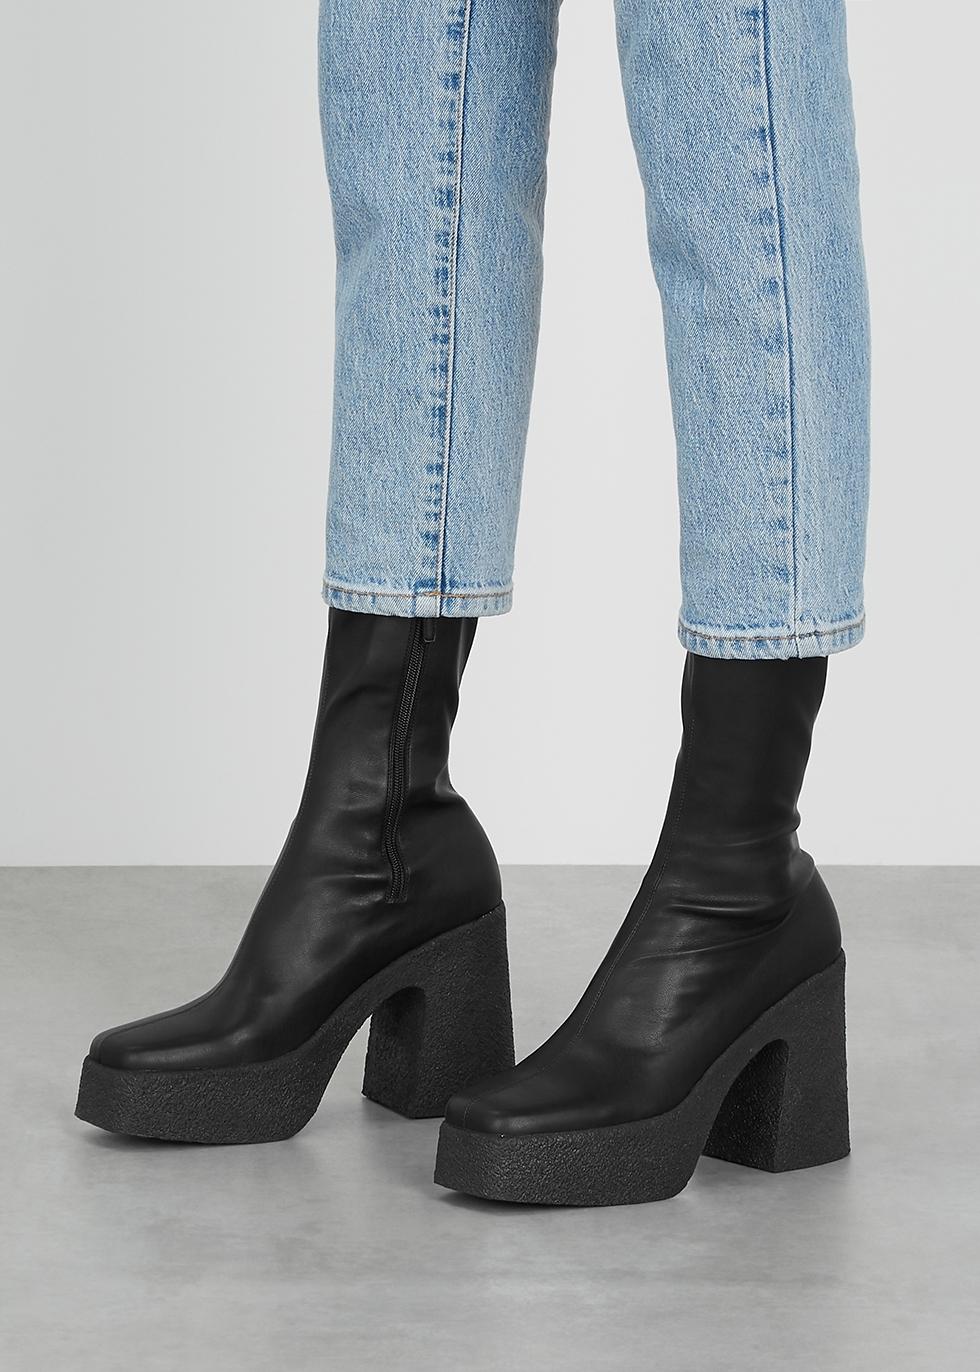 Stella McCartney 115 black faux leather